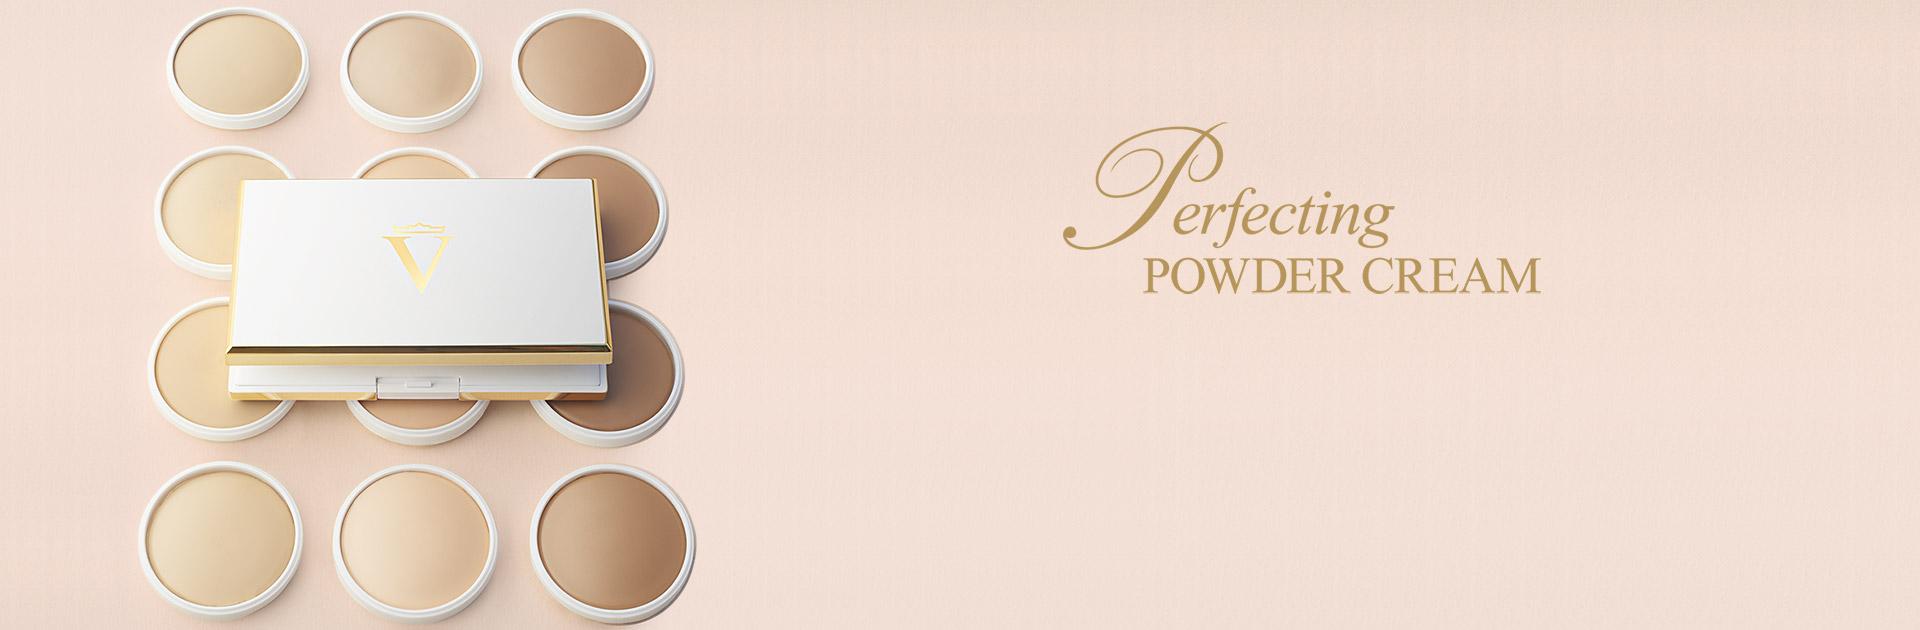 Banner-Perfecting-Powder-Cream.jpg